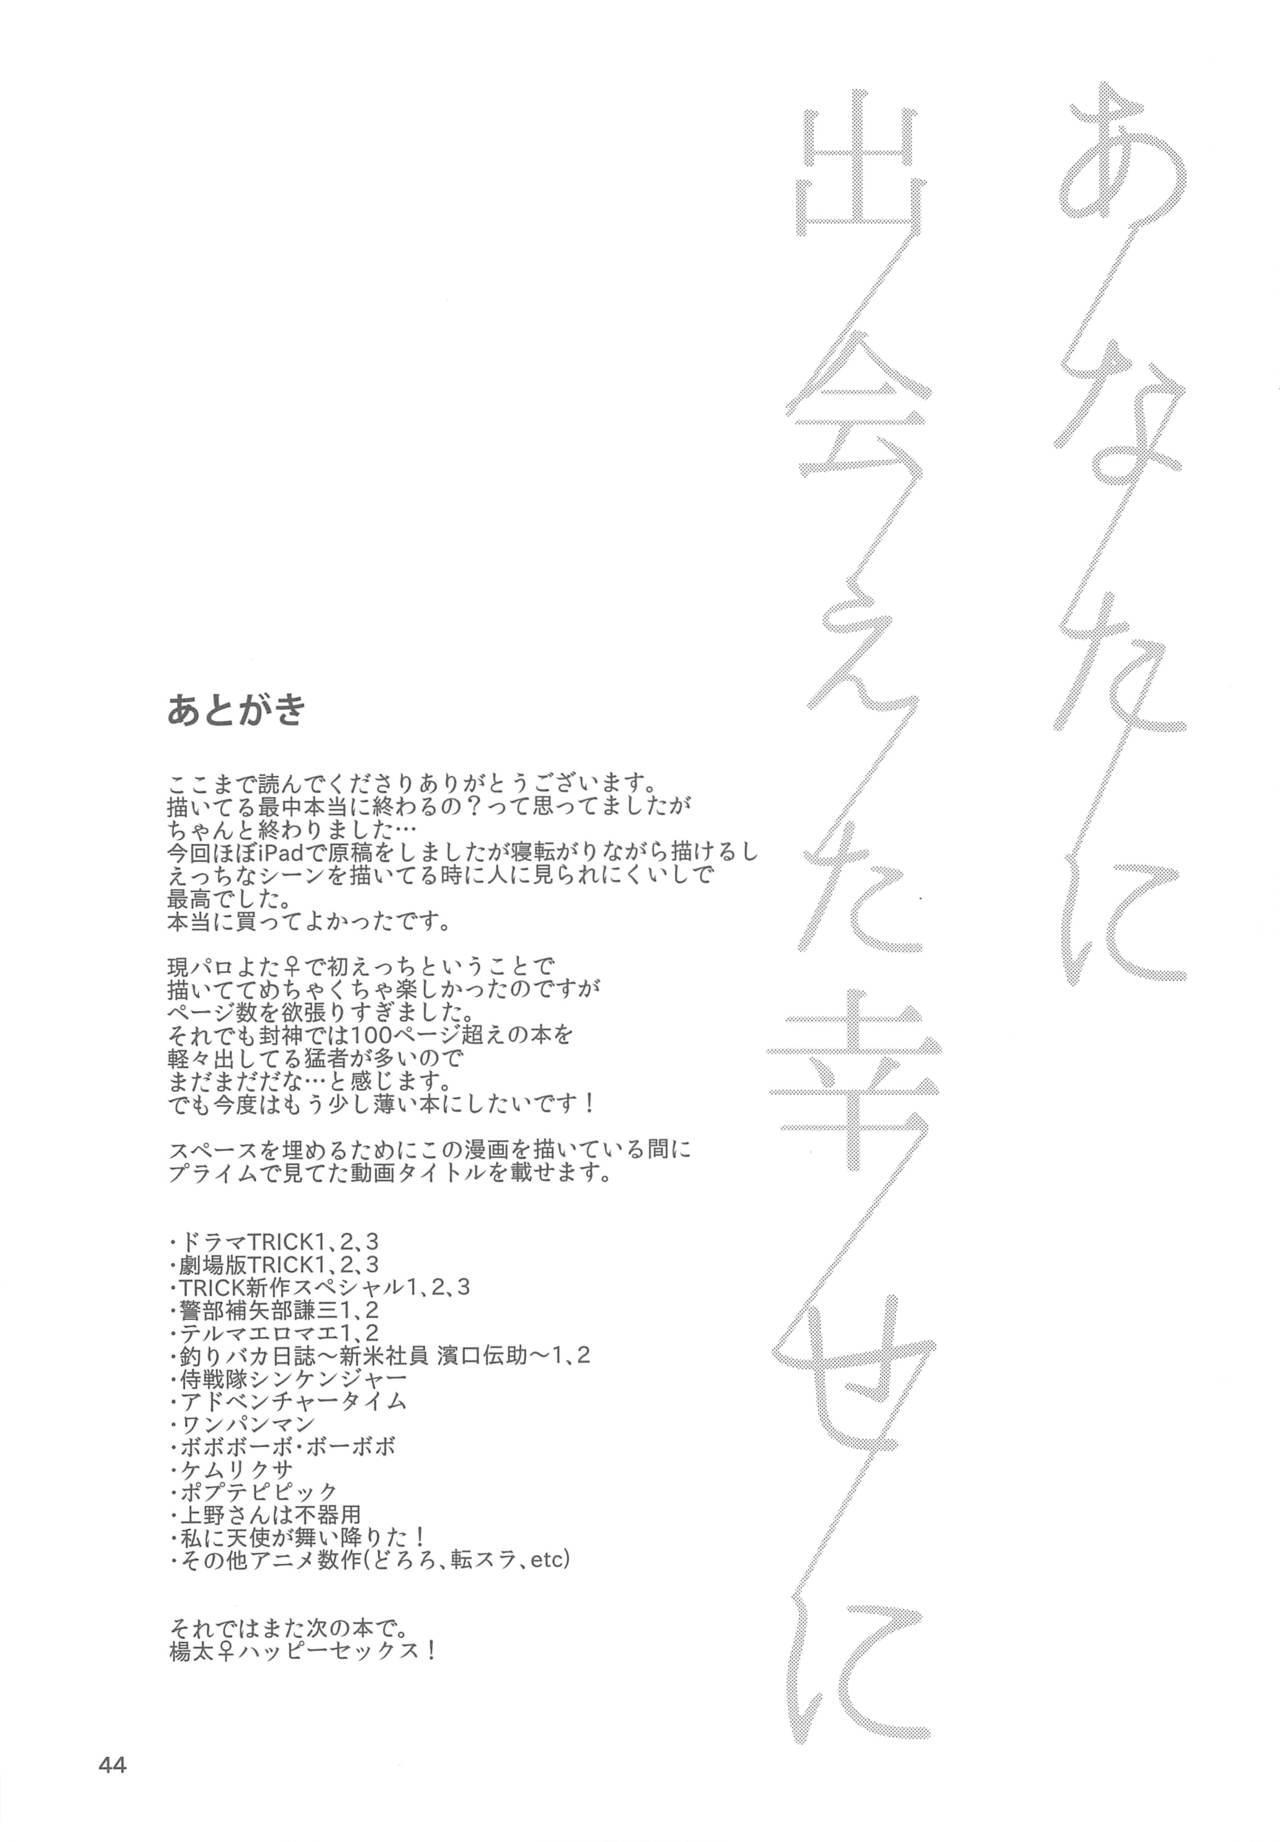 Anata ni Deaeta Shiawase ni 43